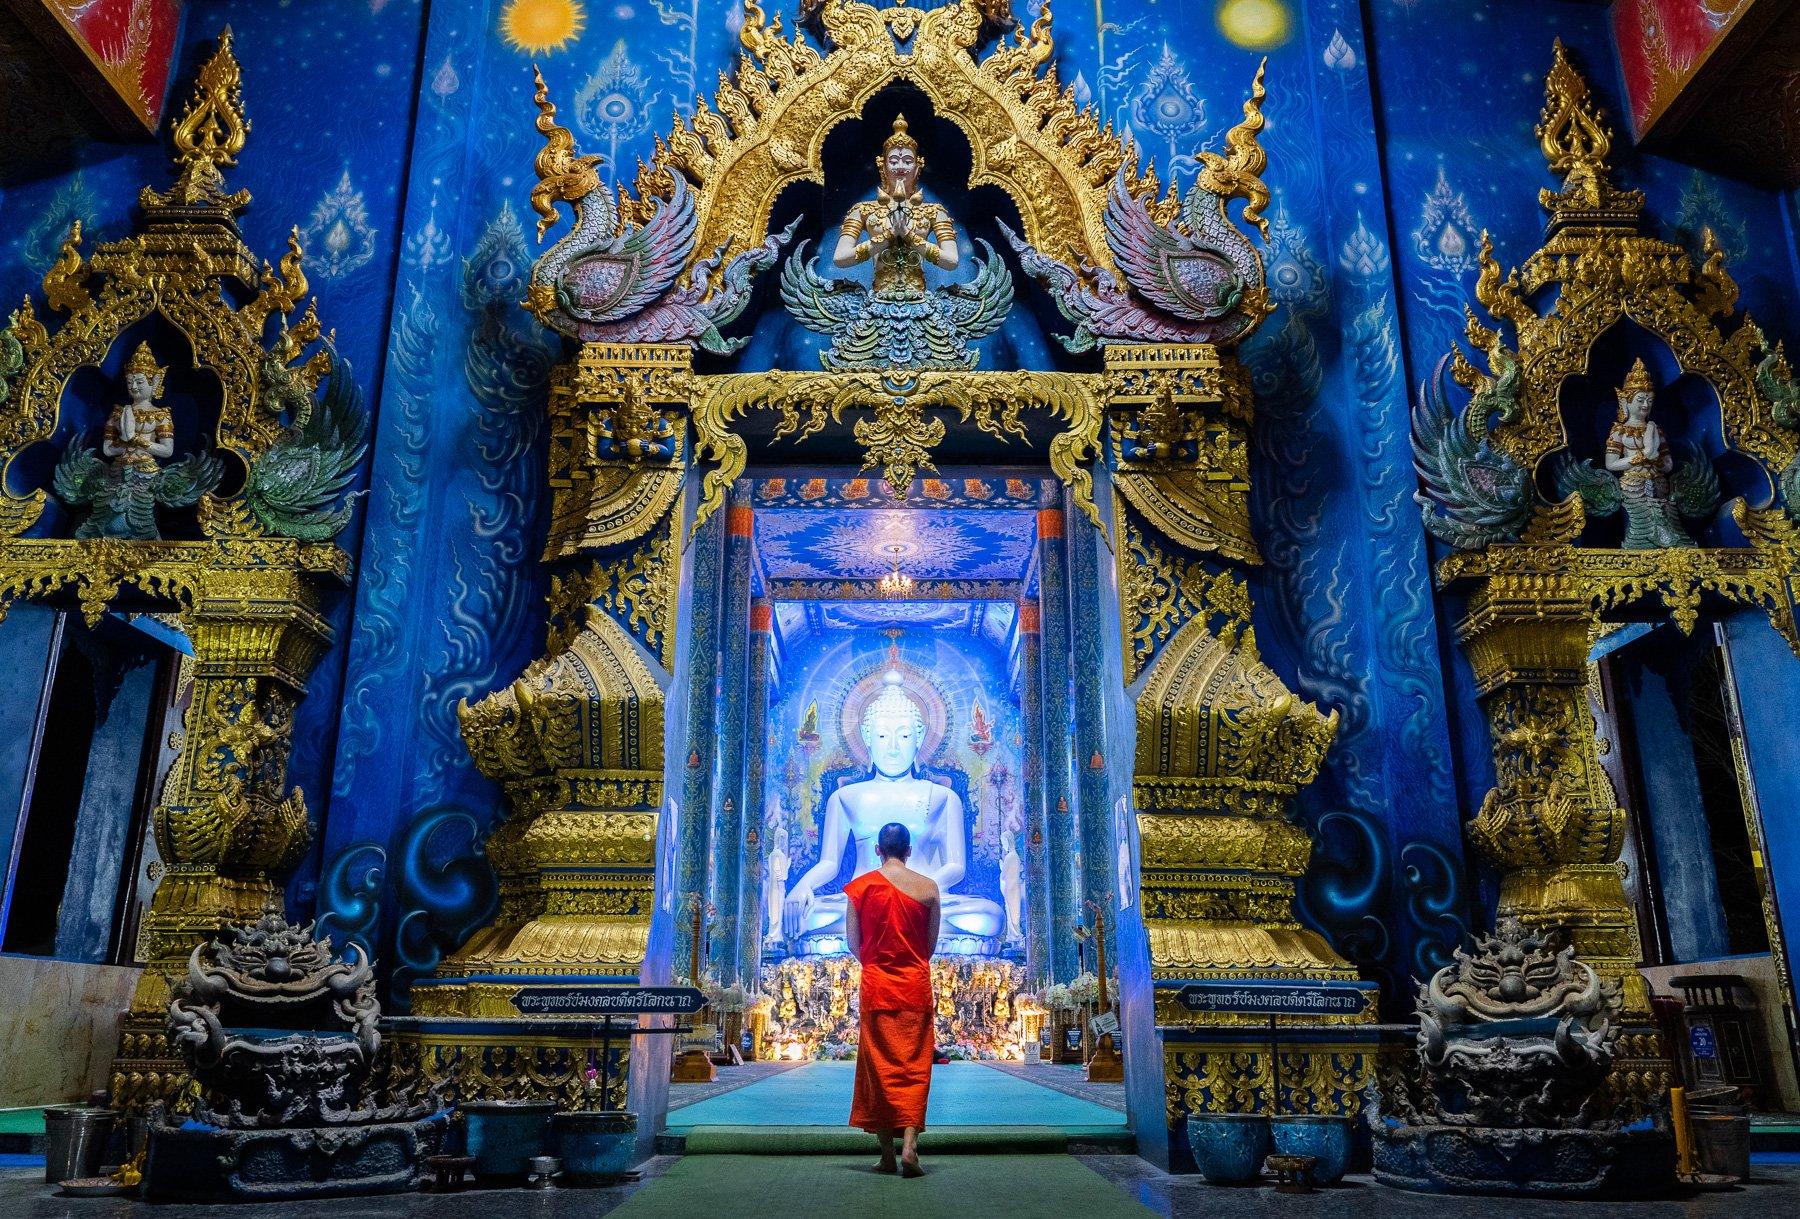 BlueTemple-Chiang-Rai_Image-by-Southeast-Asia-photo-tour